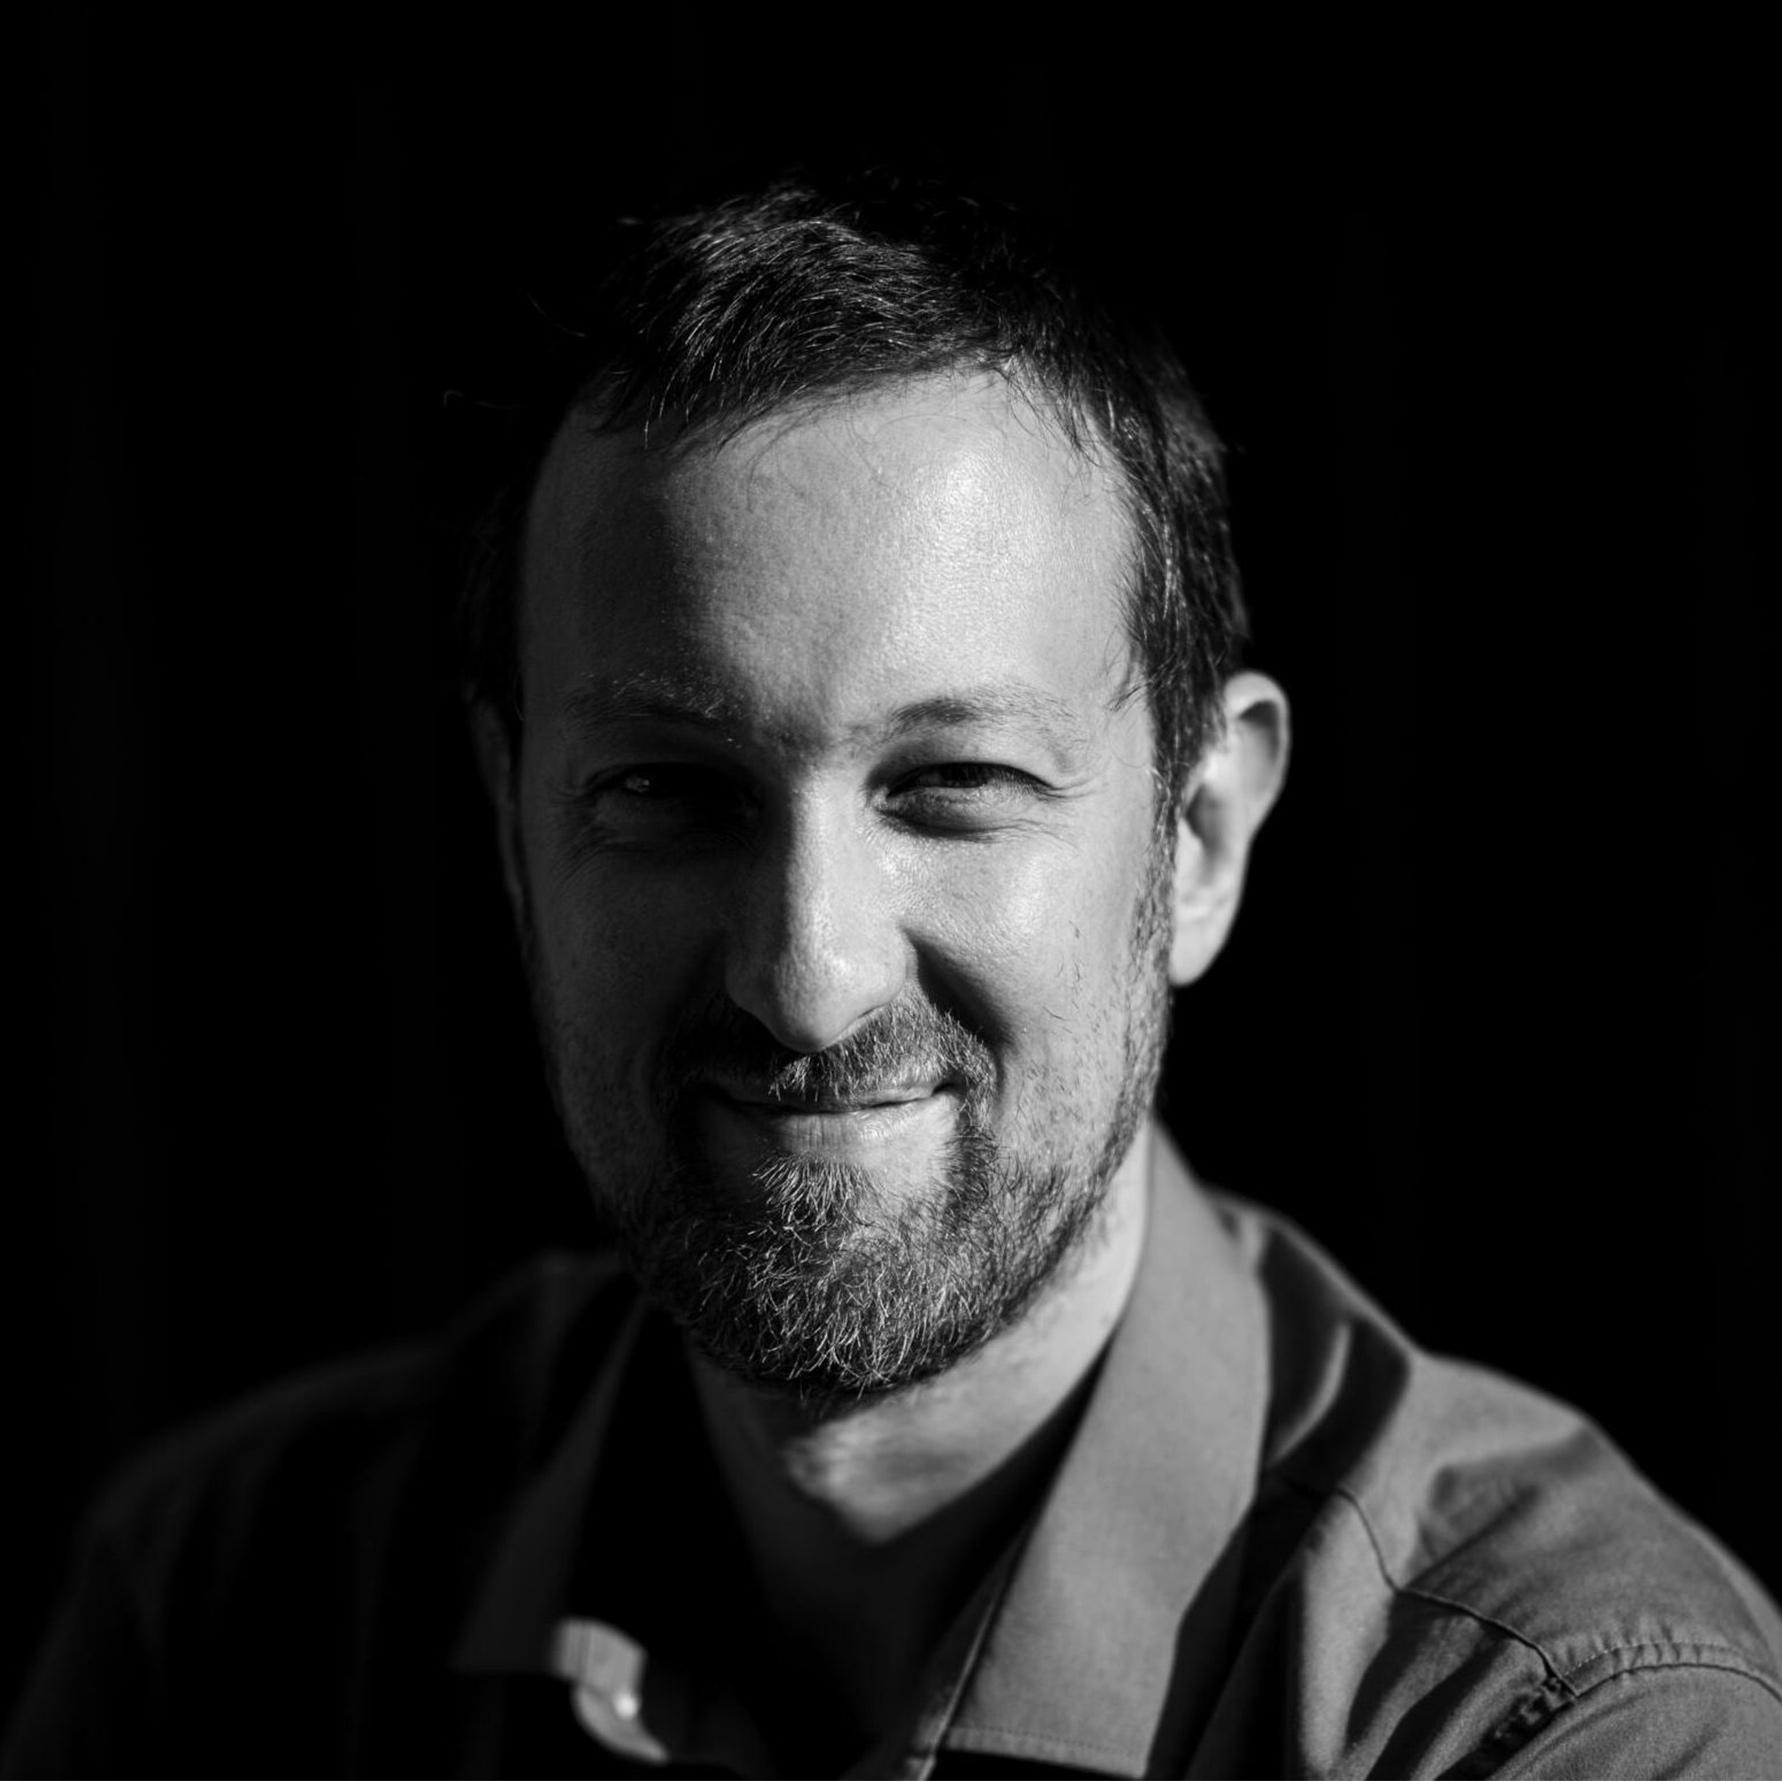 Richard Costin, Rumble VFX founder